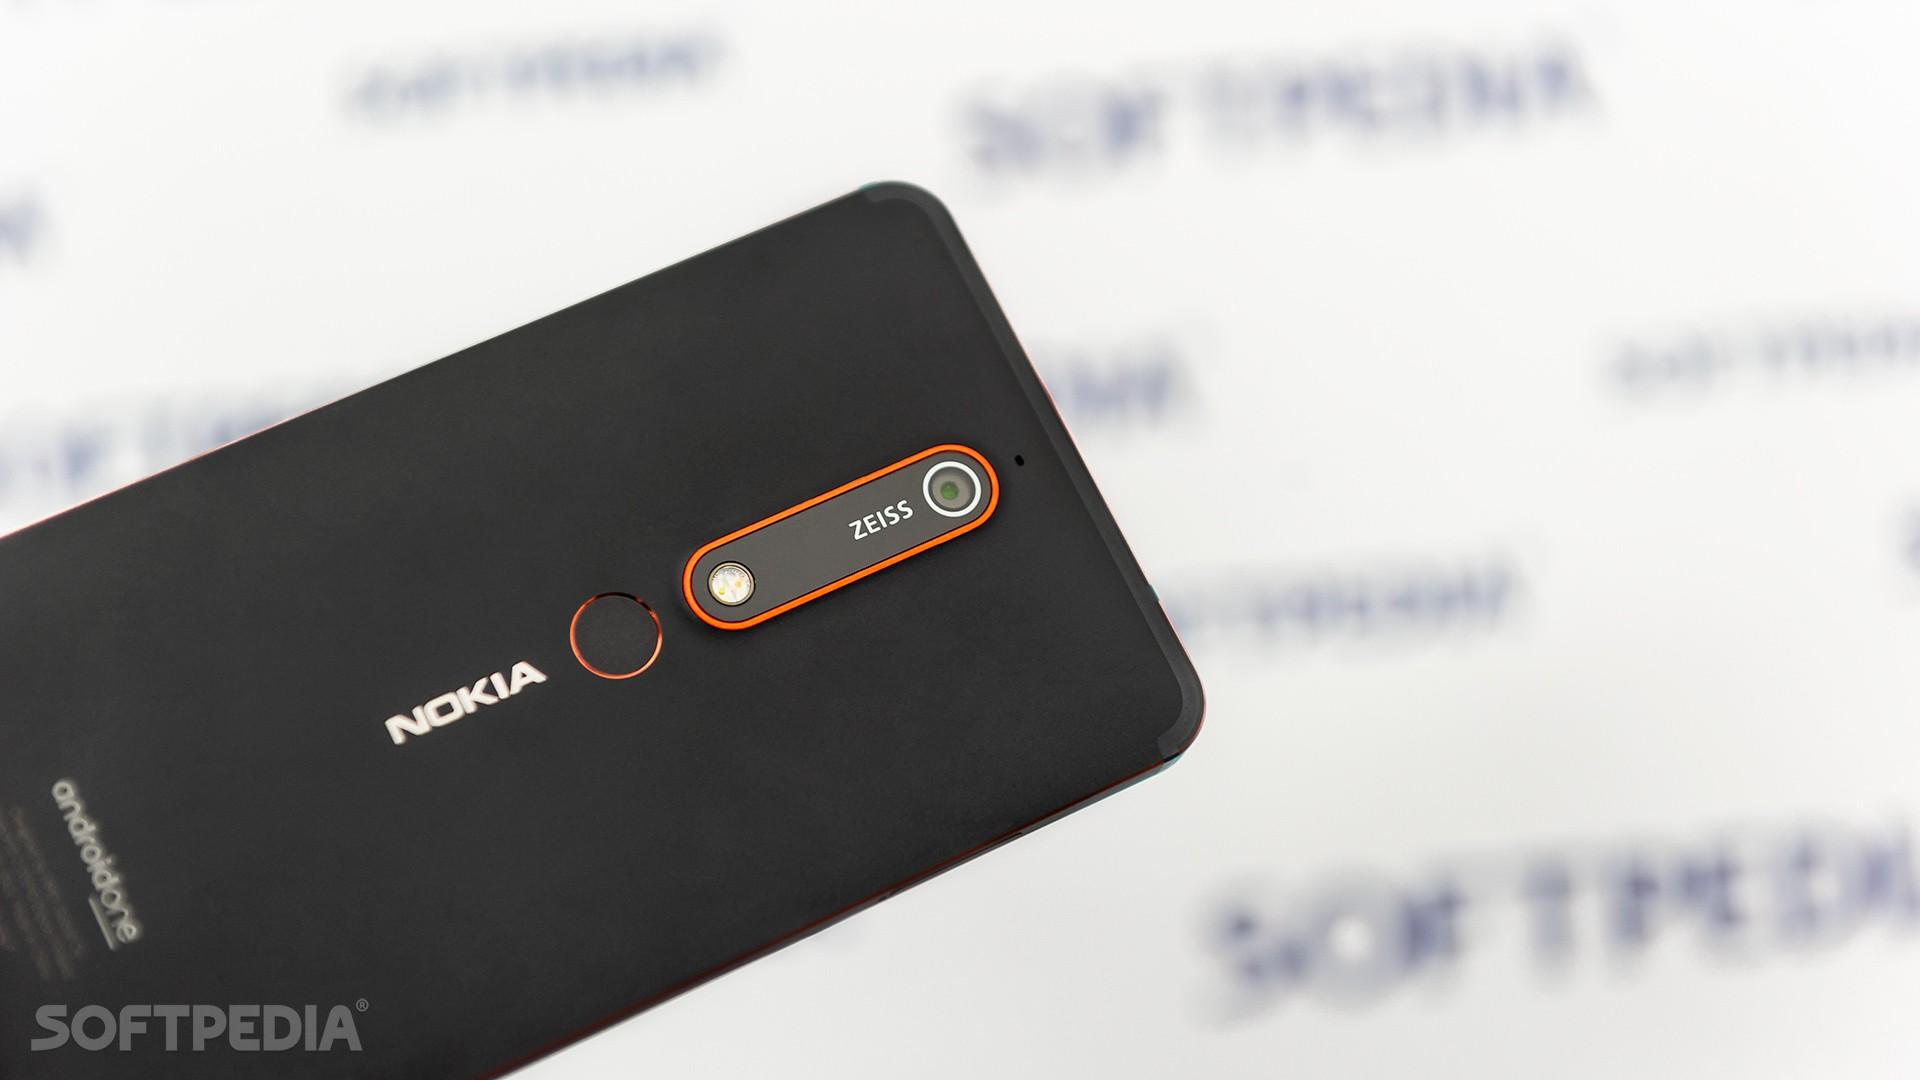 Nokia 6 (2018) Review - Twenty-Four Carat Android